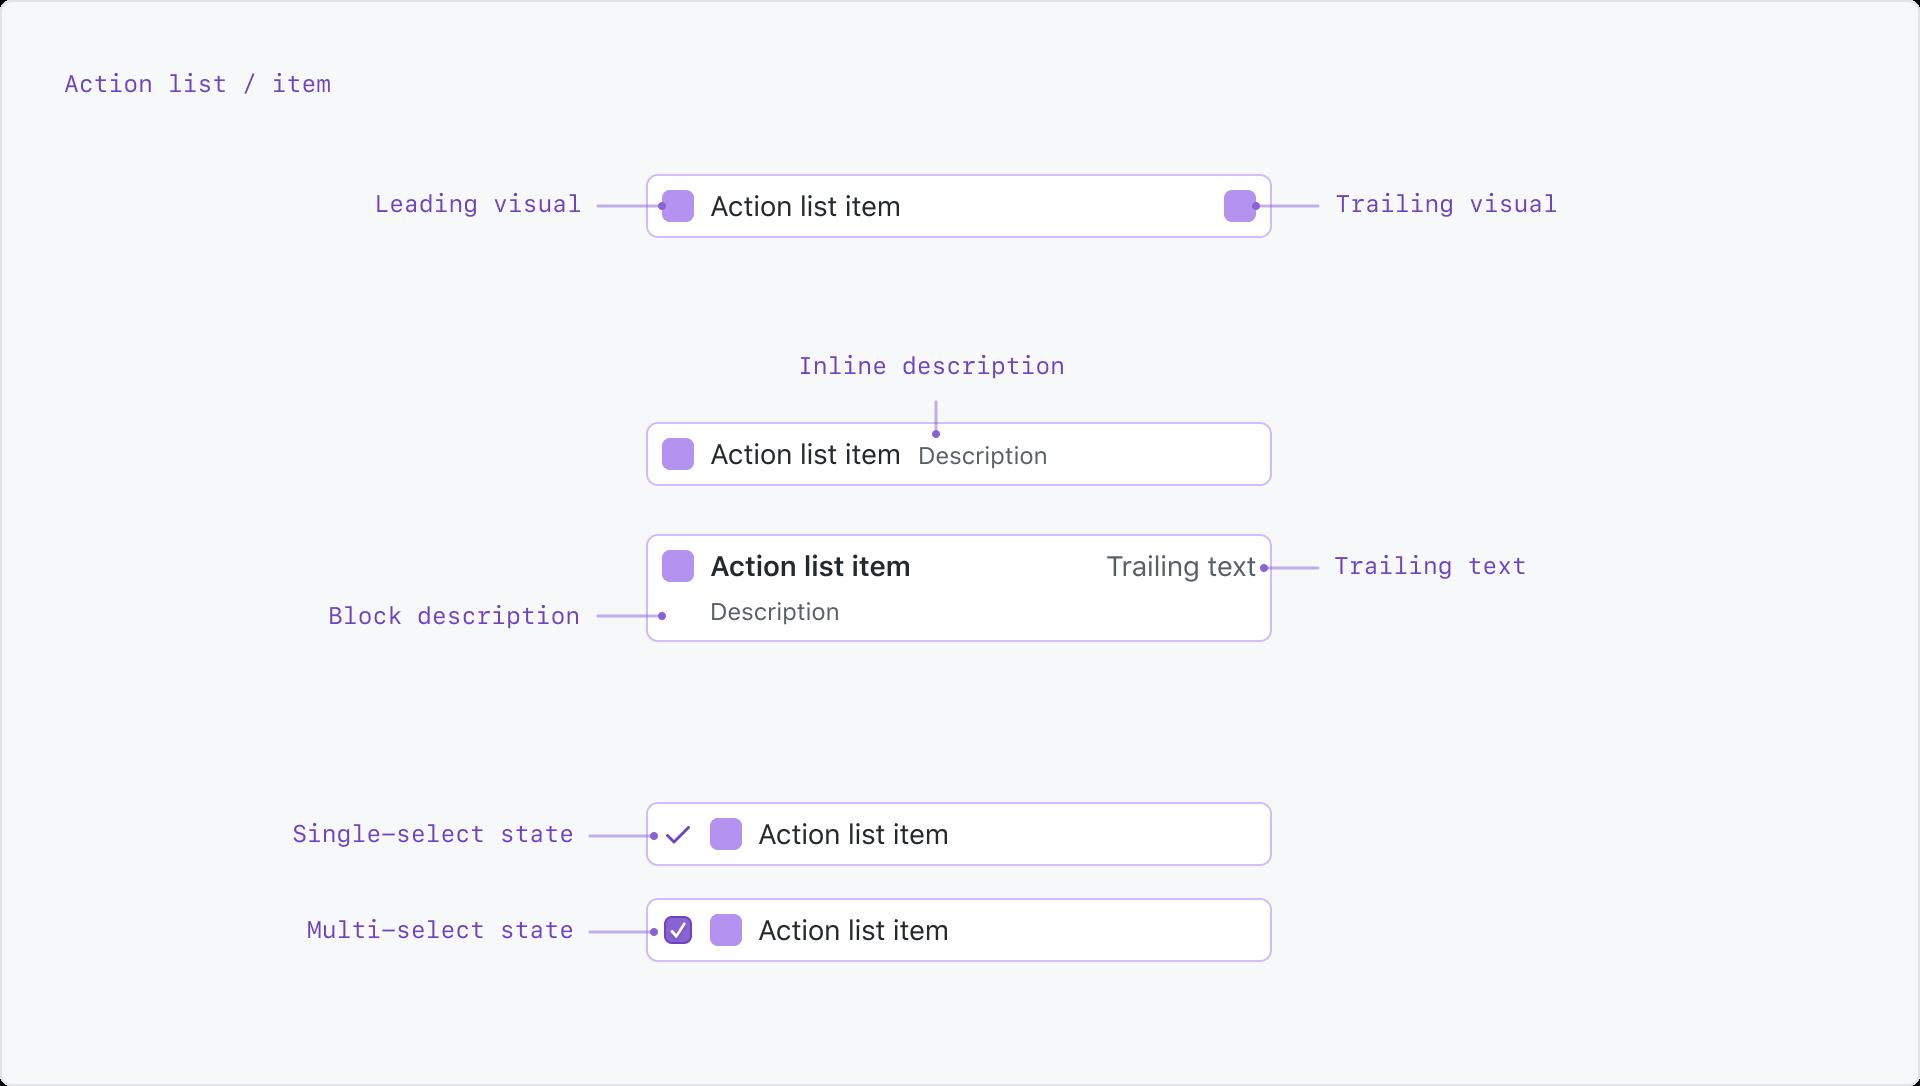 Action list item anatomy